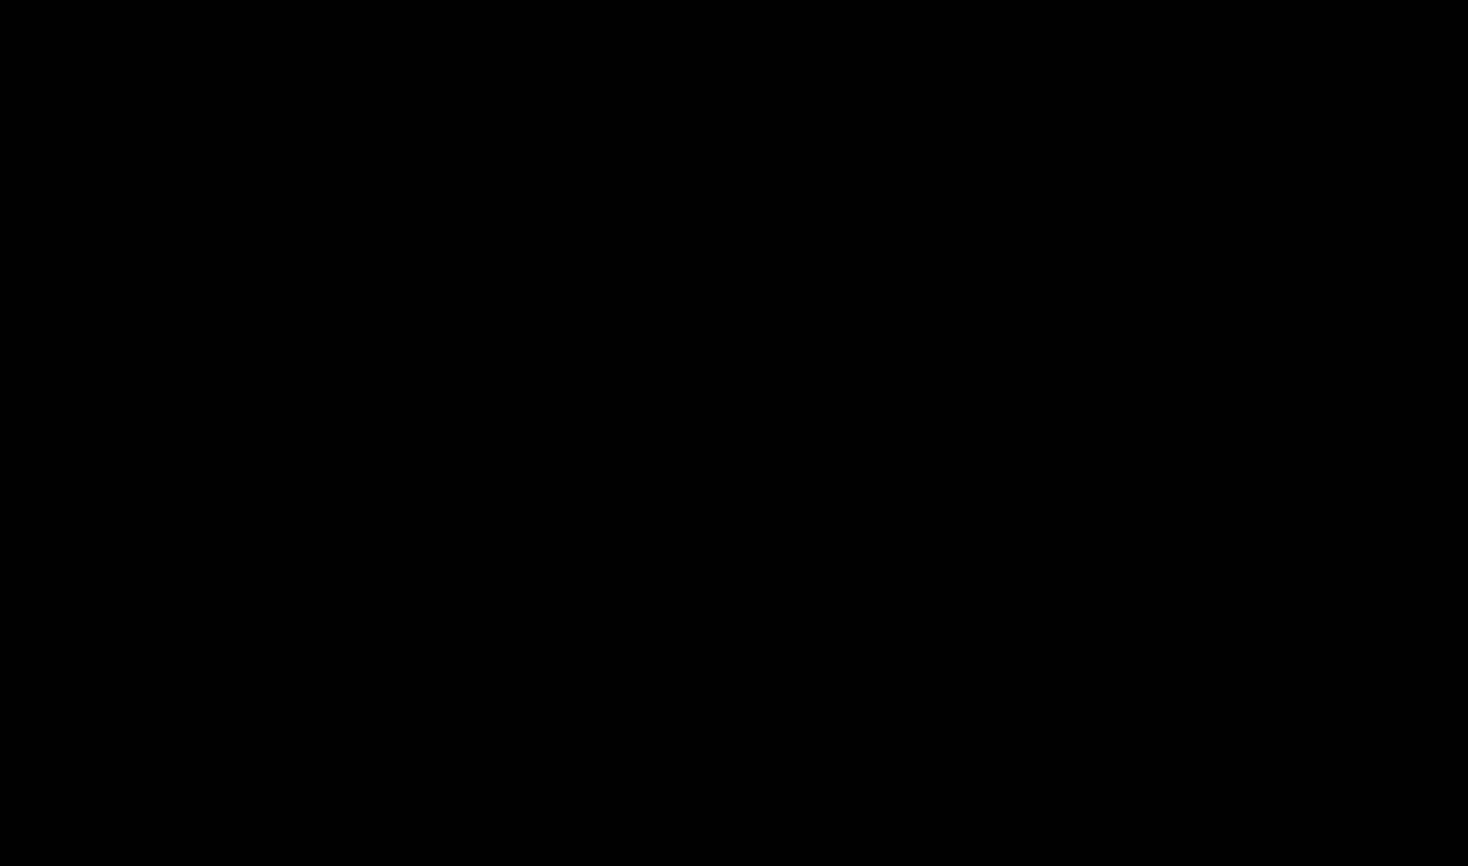 1,3-Di-O-tert-butyldimethylsilyl Paricalcitol 18-Aldehyde